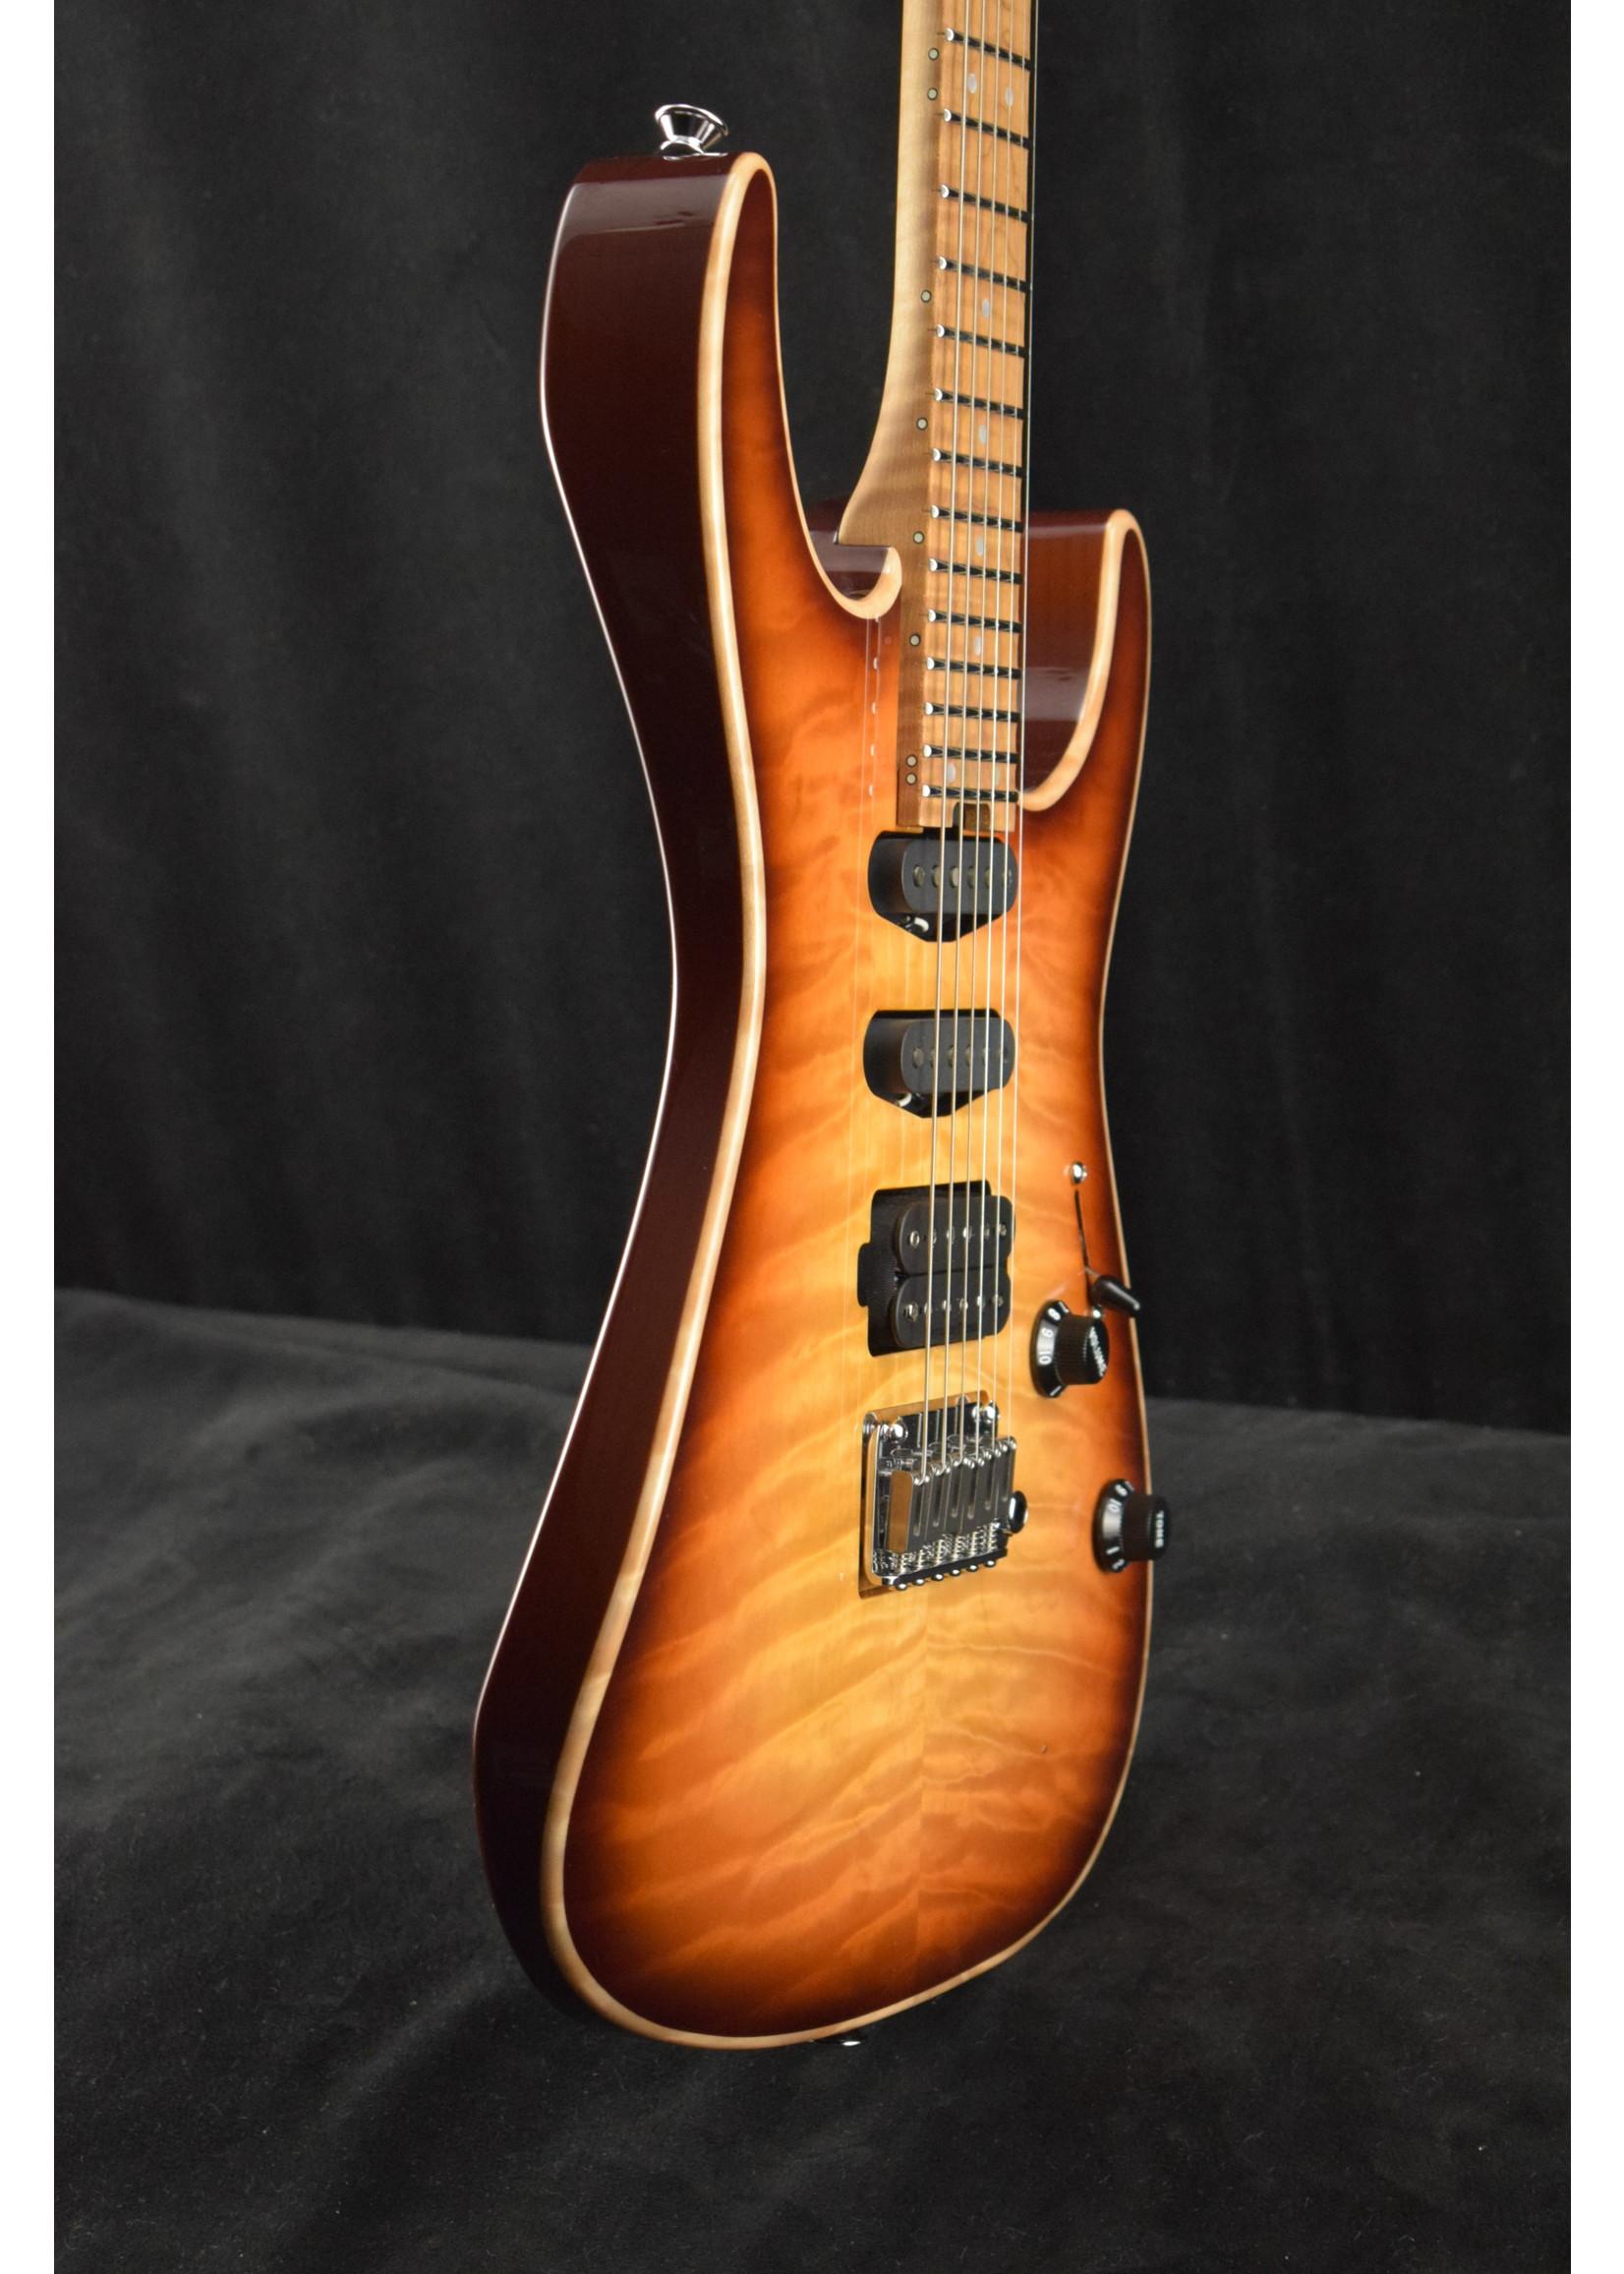 Charvel Charvel USA Select DK24 HSS 2PT CM QM Autumn Glow